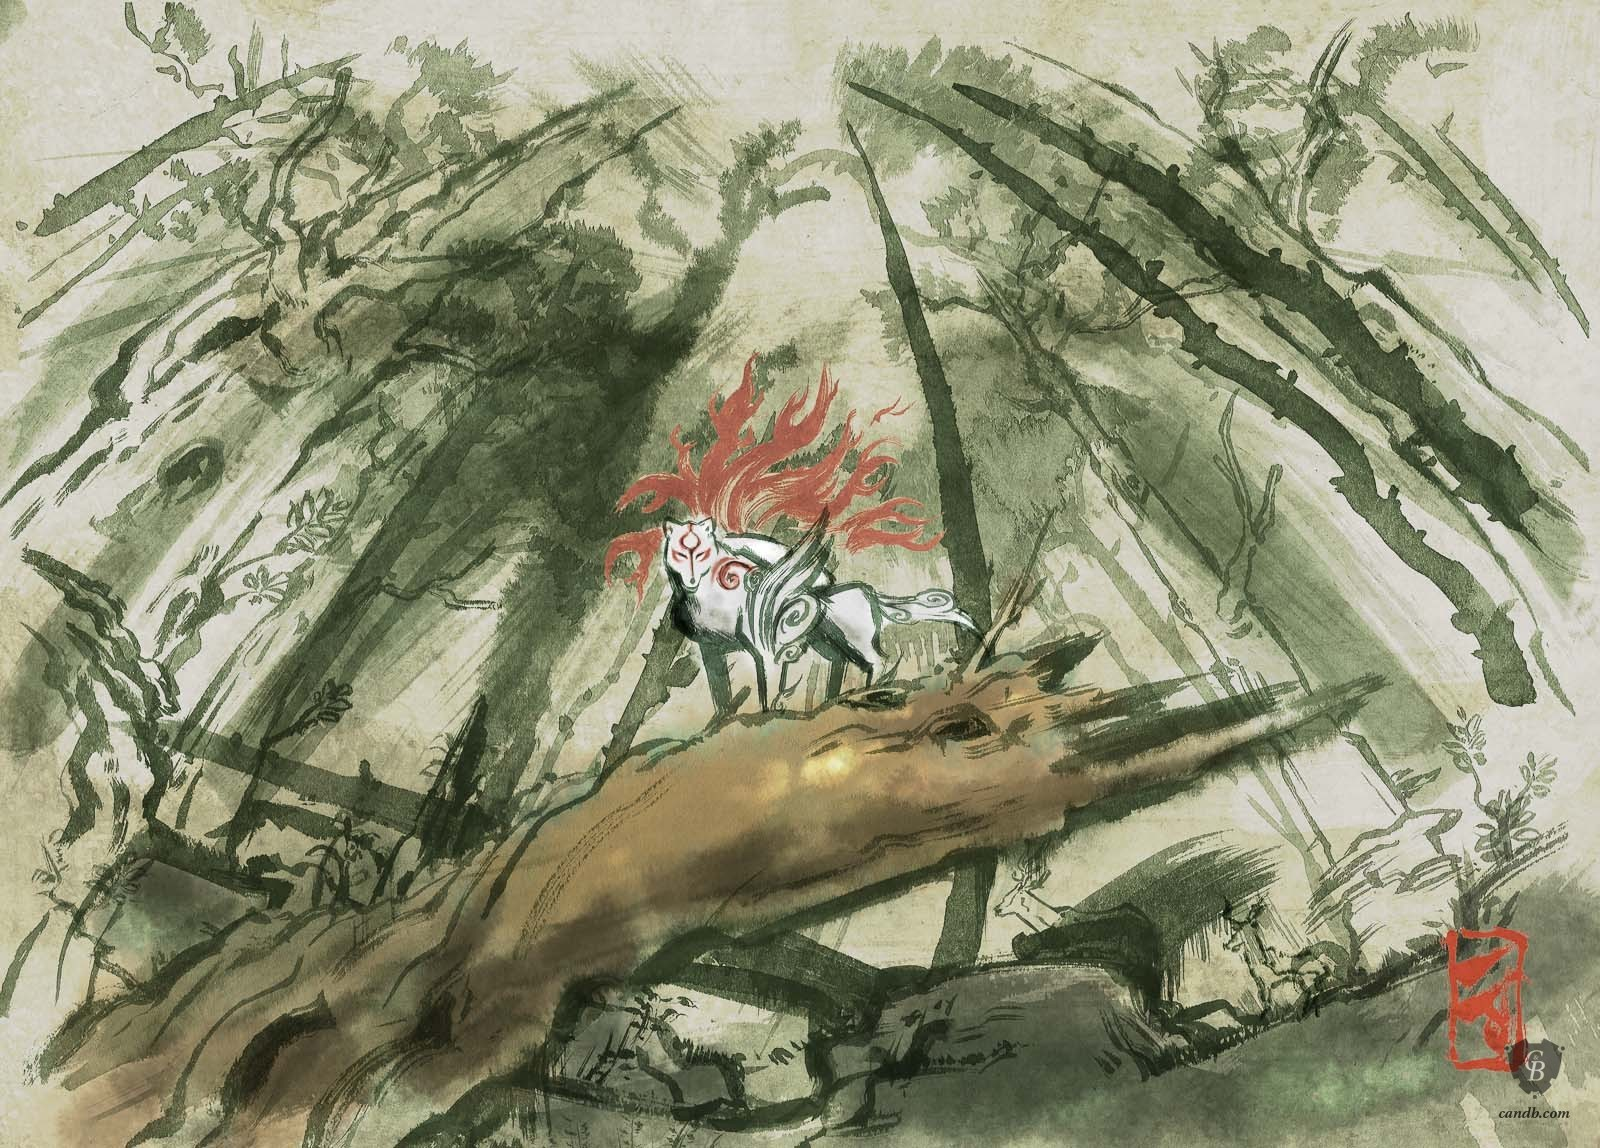 Kunstwerk Agata Forest Okami Capcom